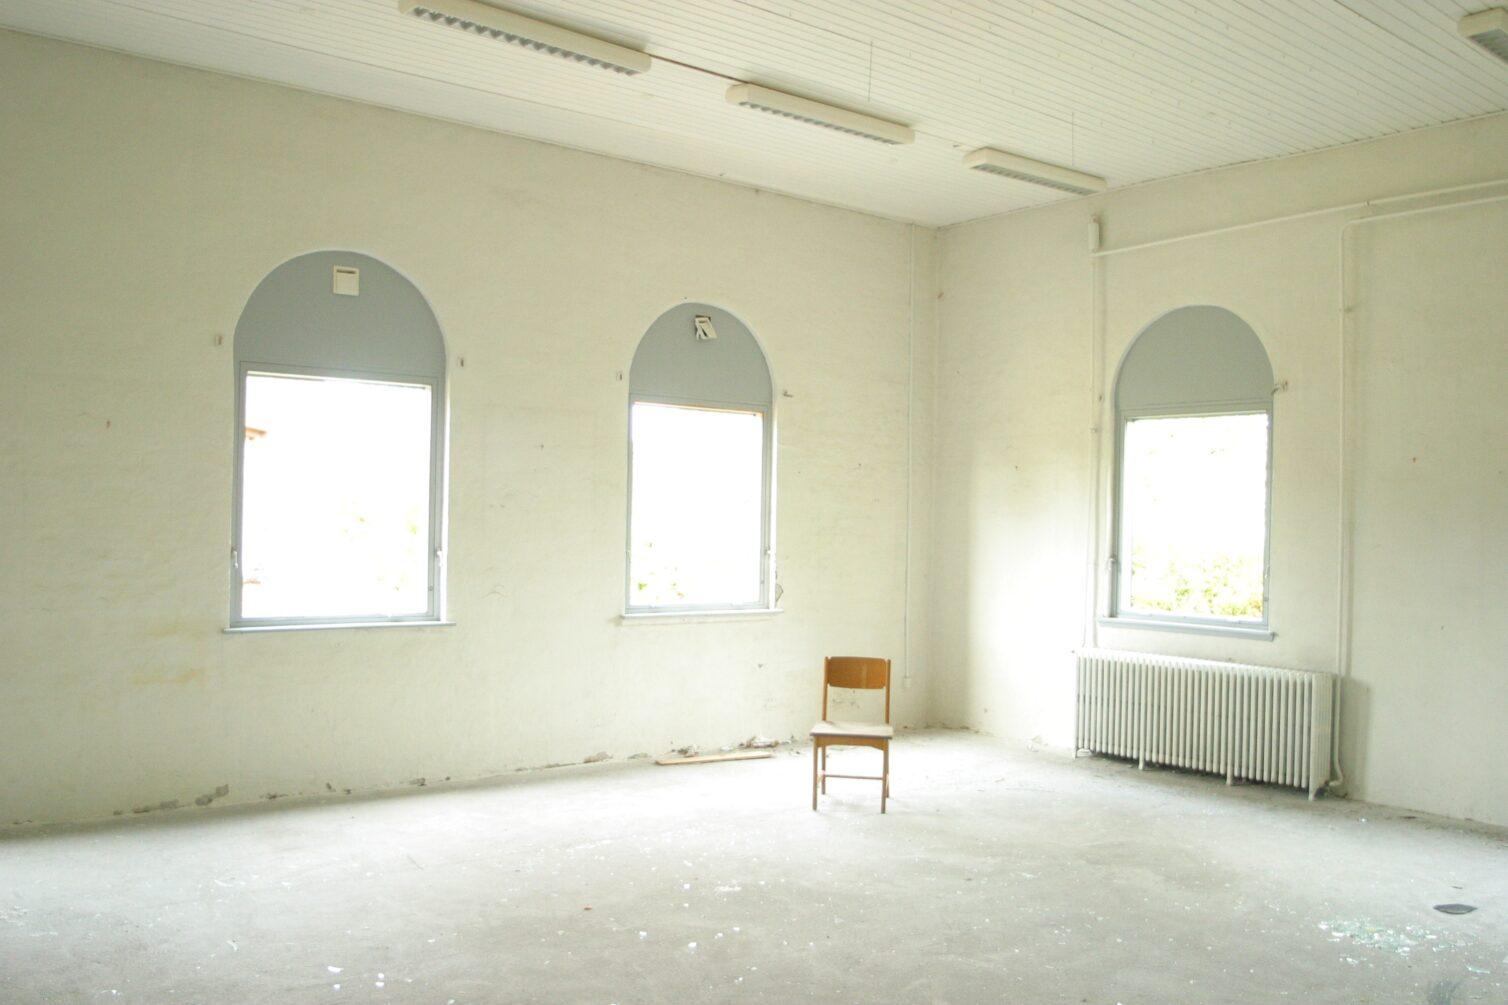 Demised premises - landlords and tenants